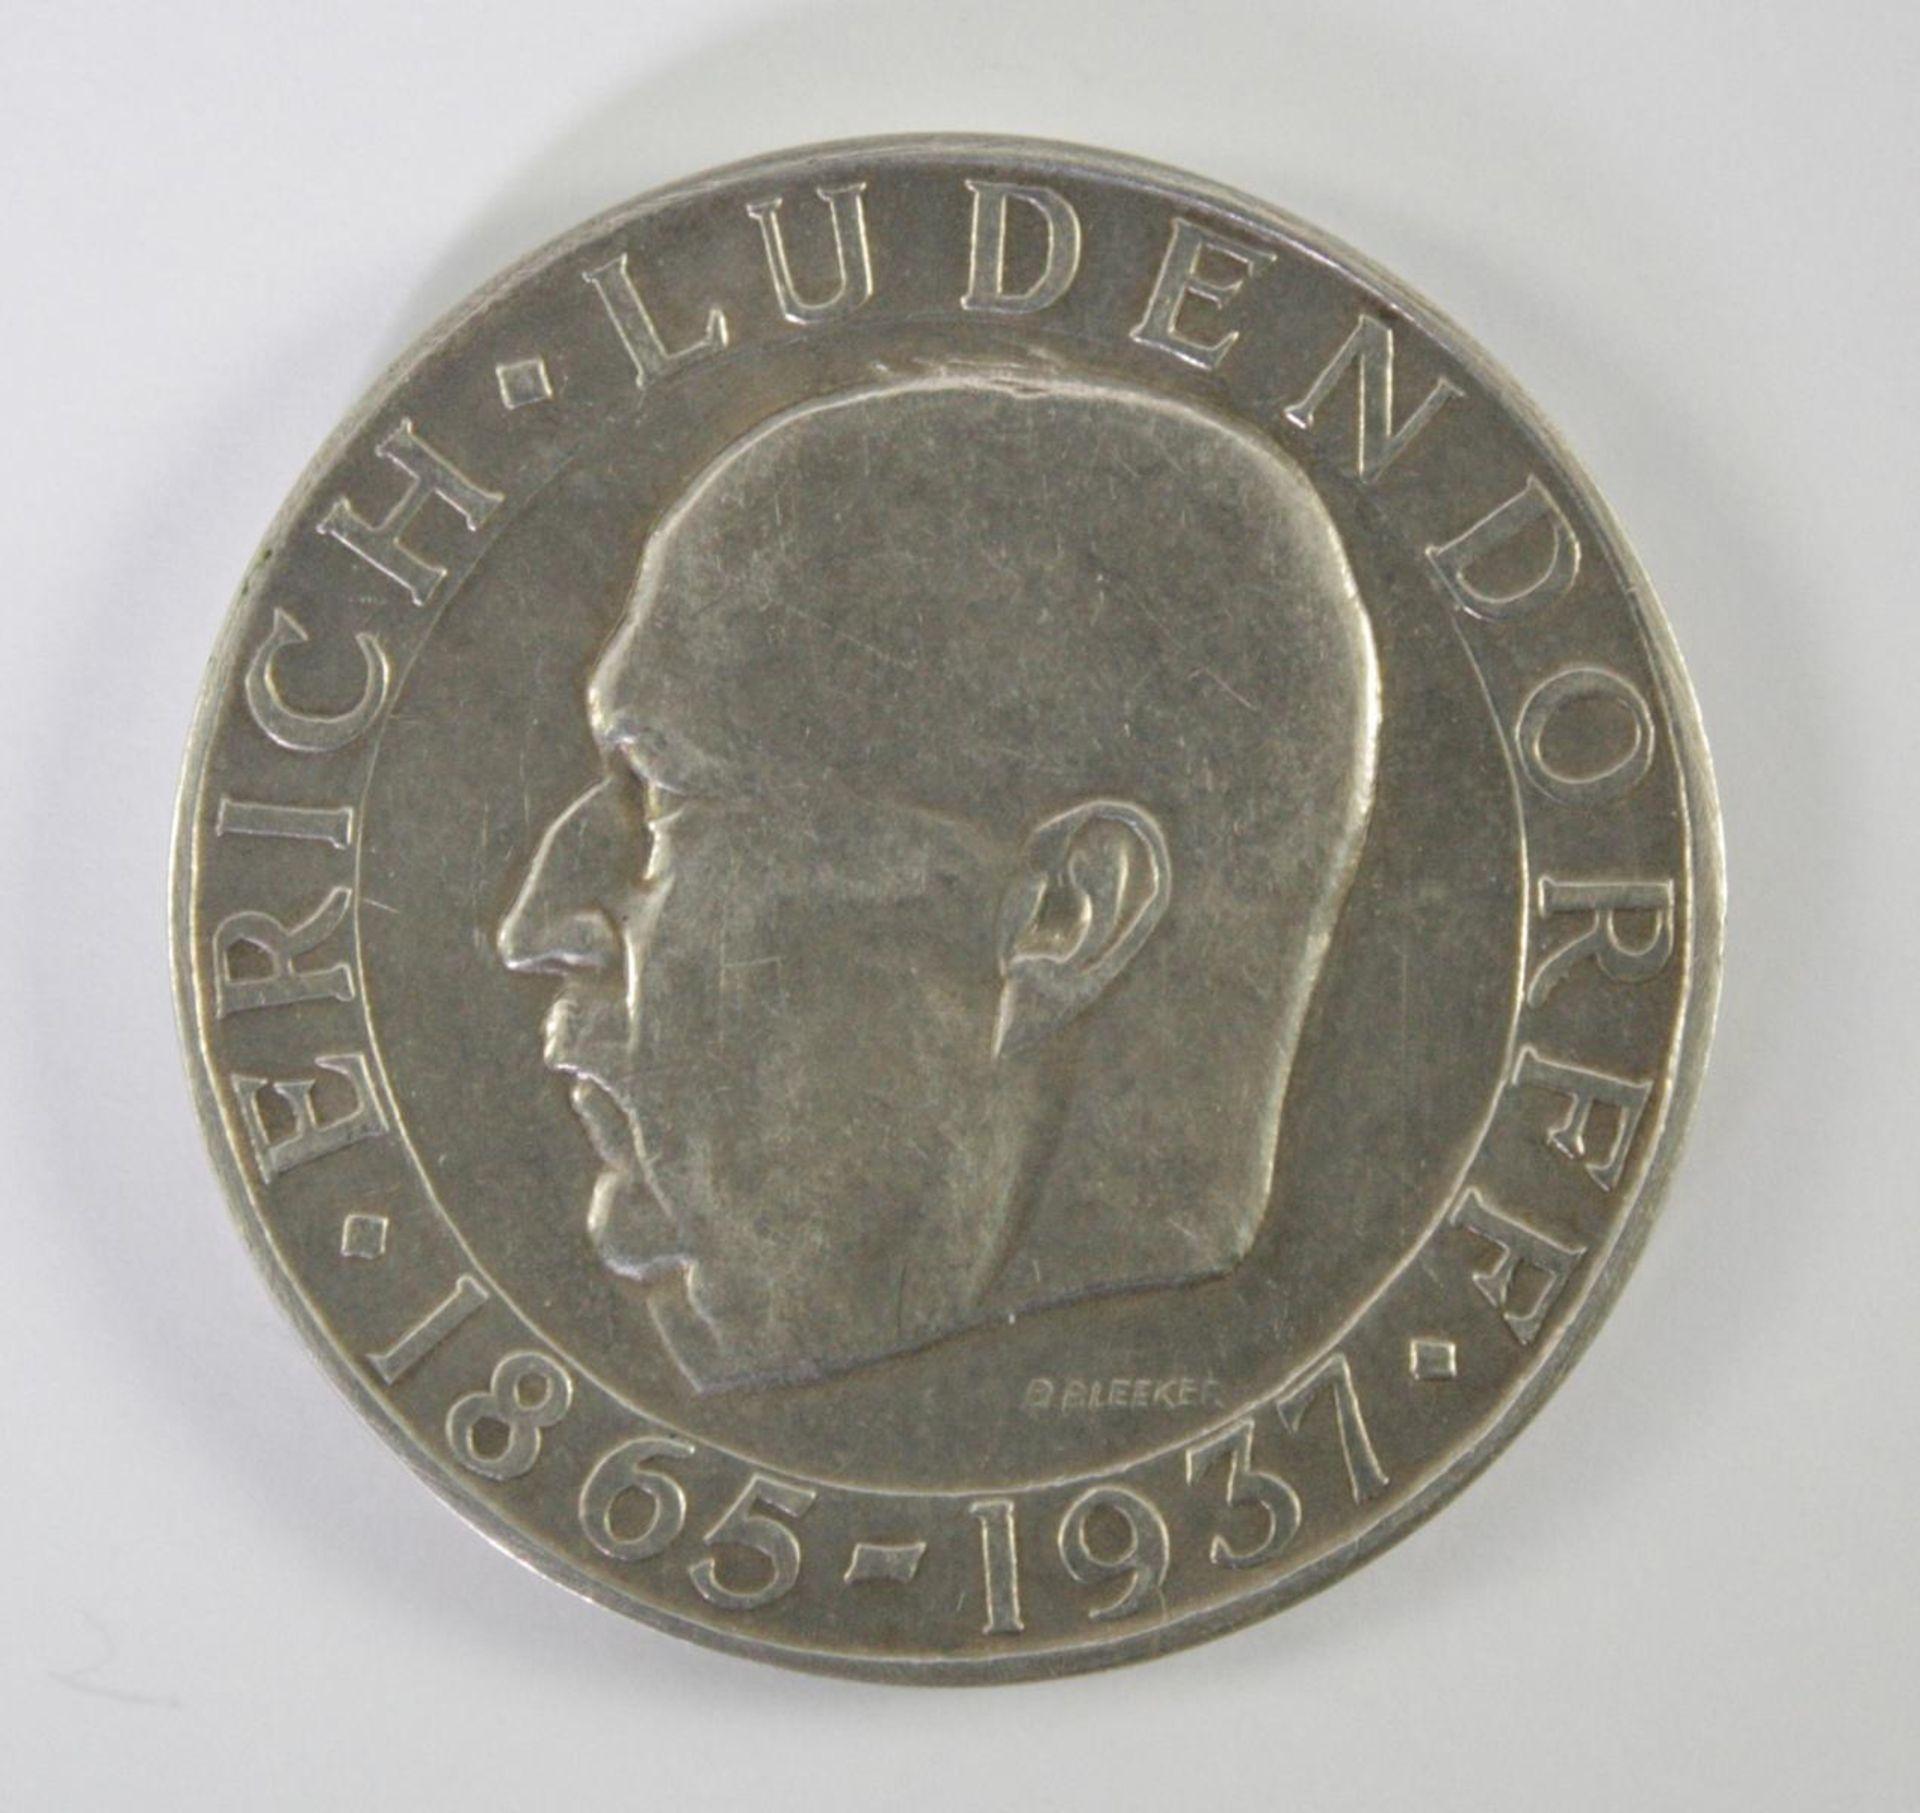 Silbermedaille, Erich Ludendorff 1865-1937